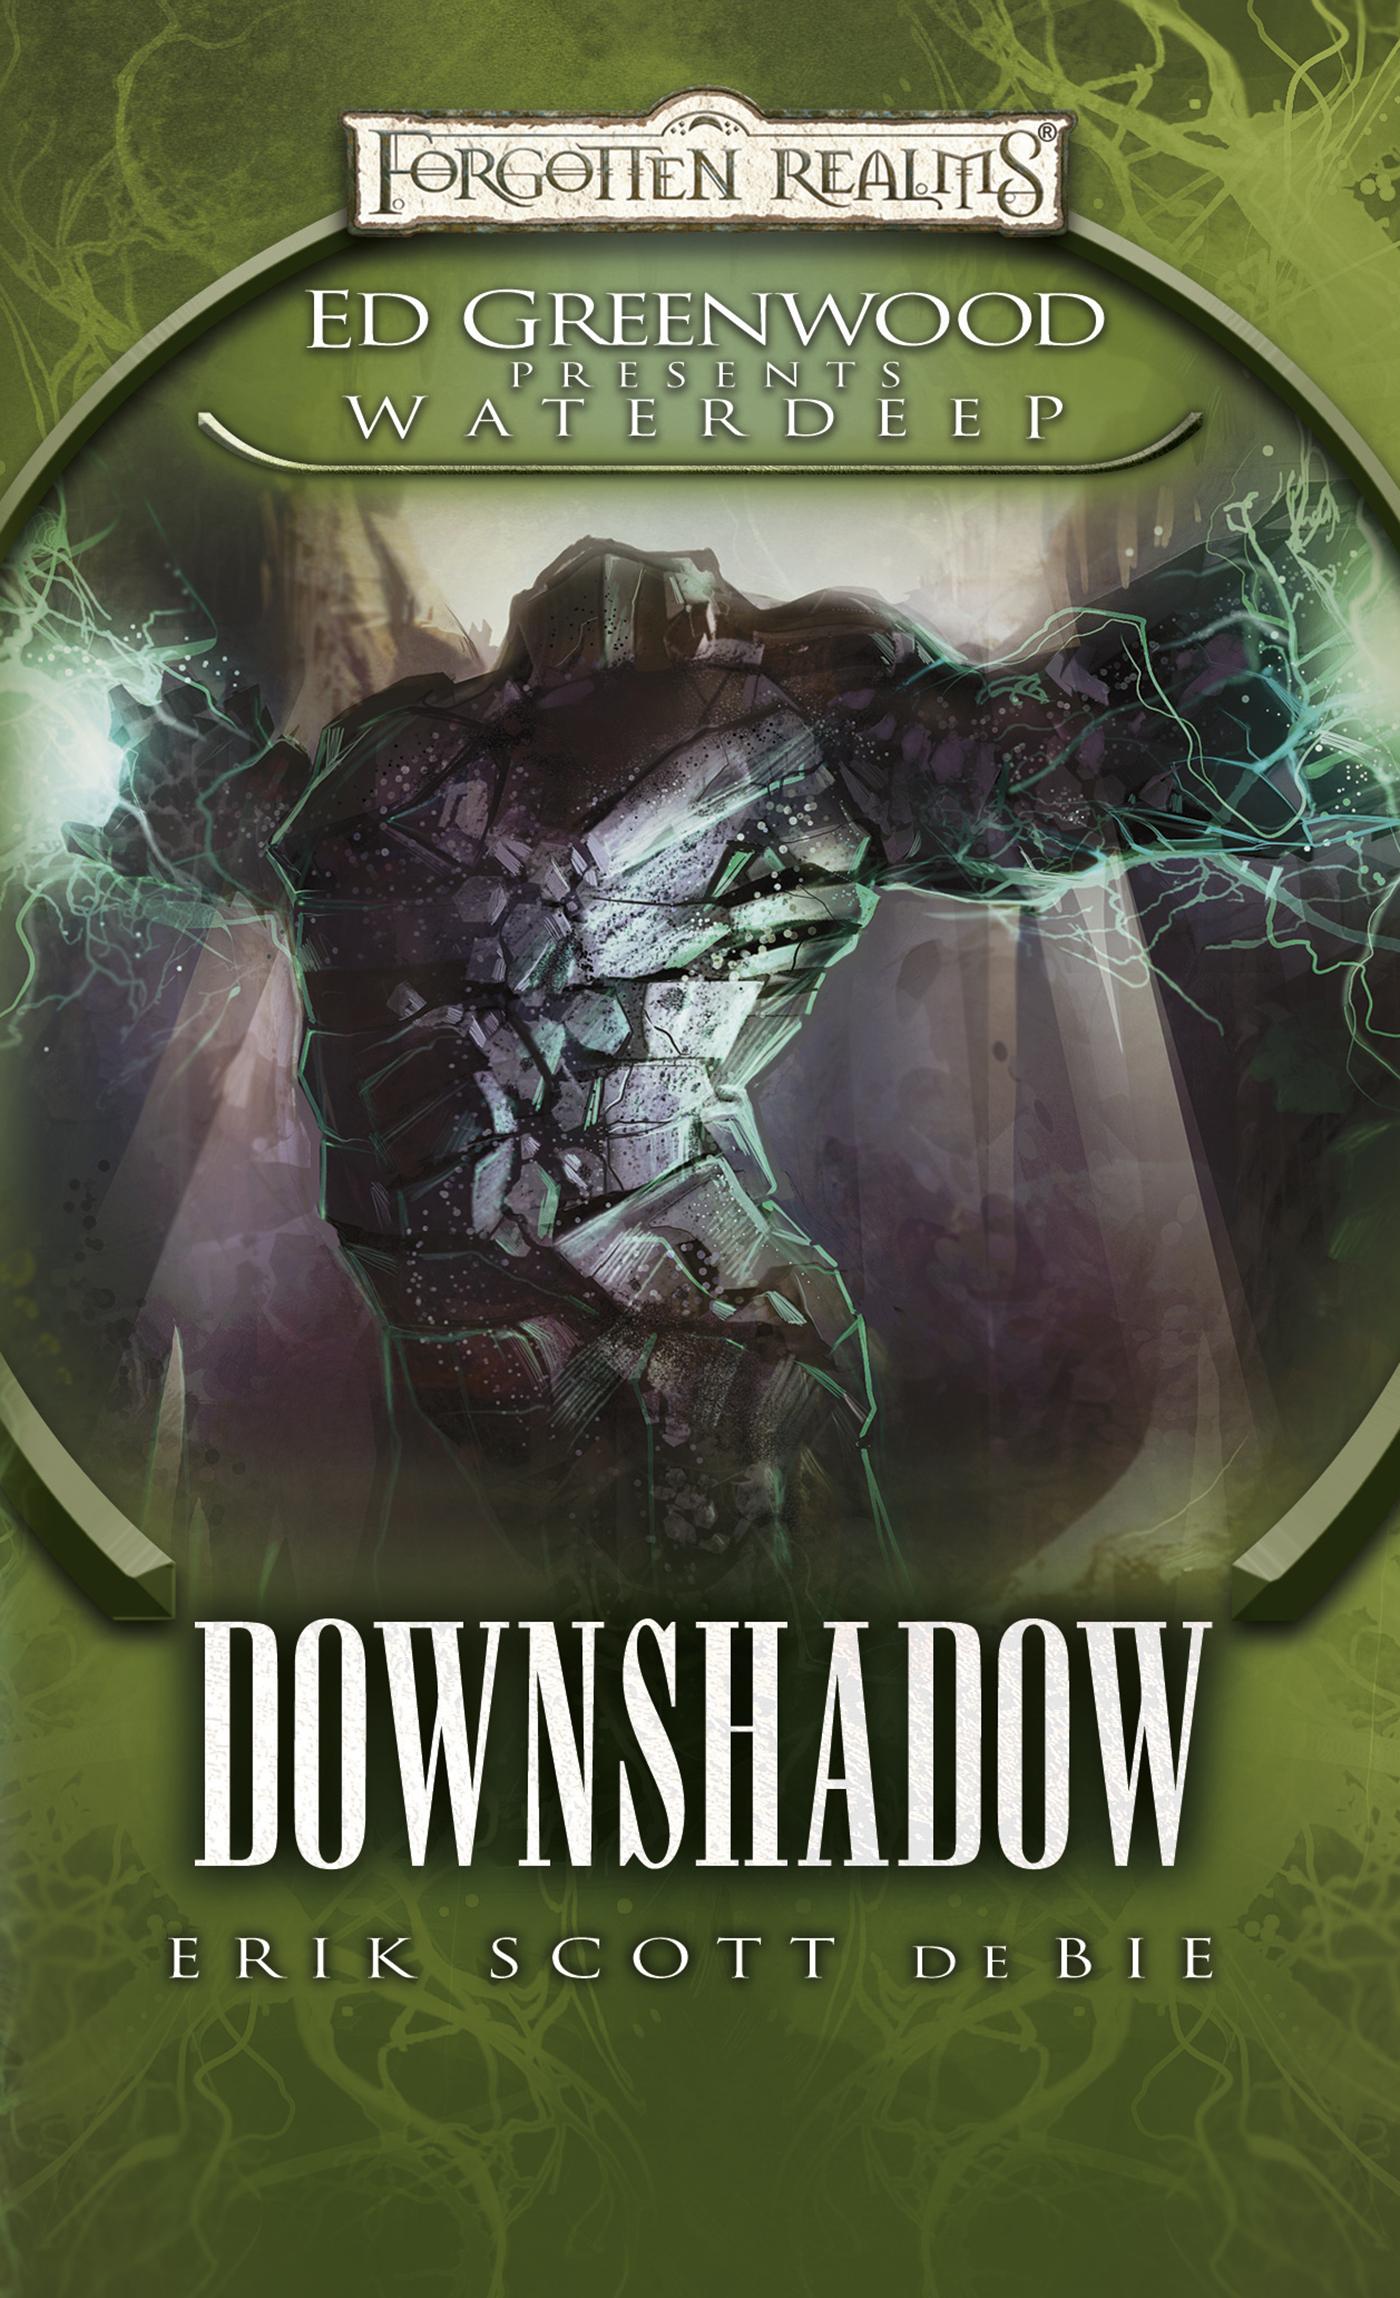 Downshadow (novel)